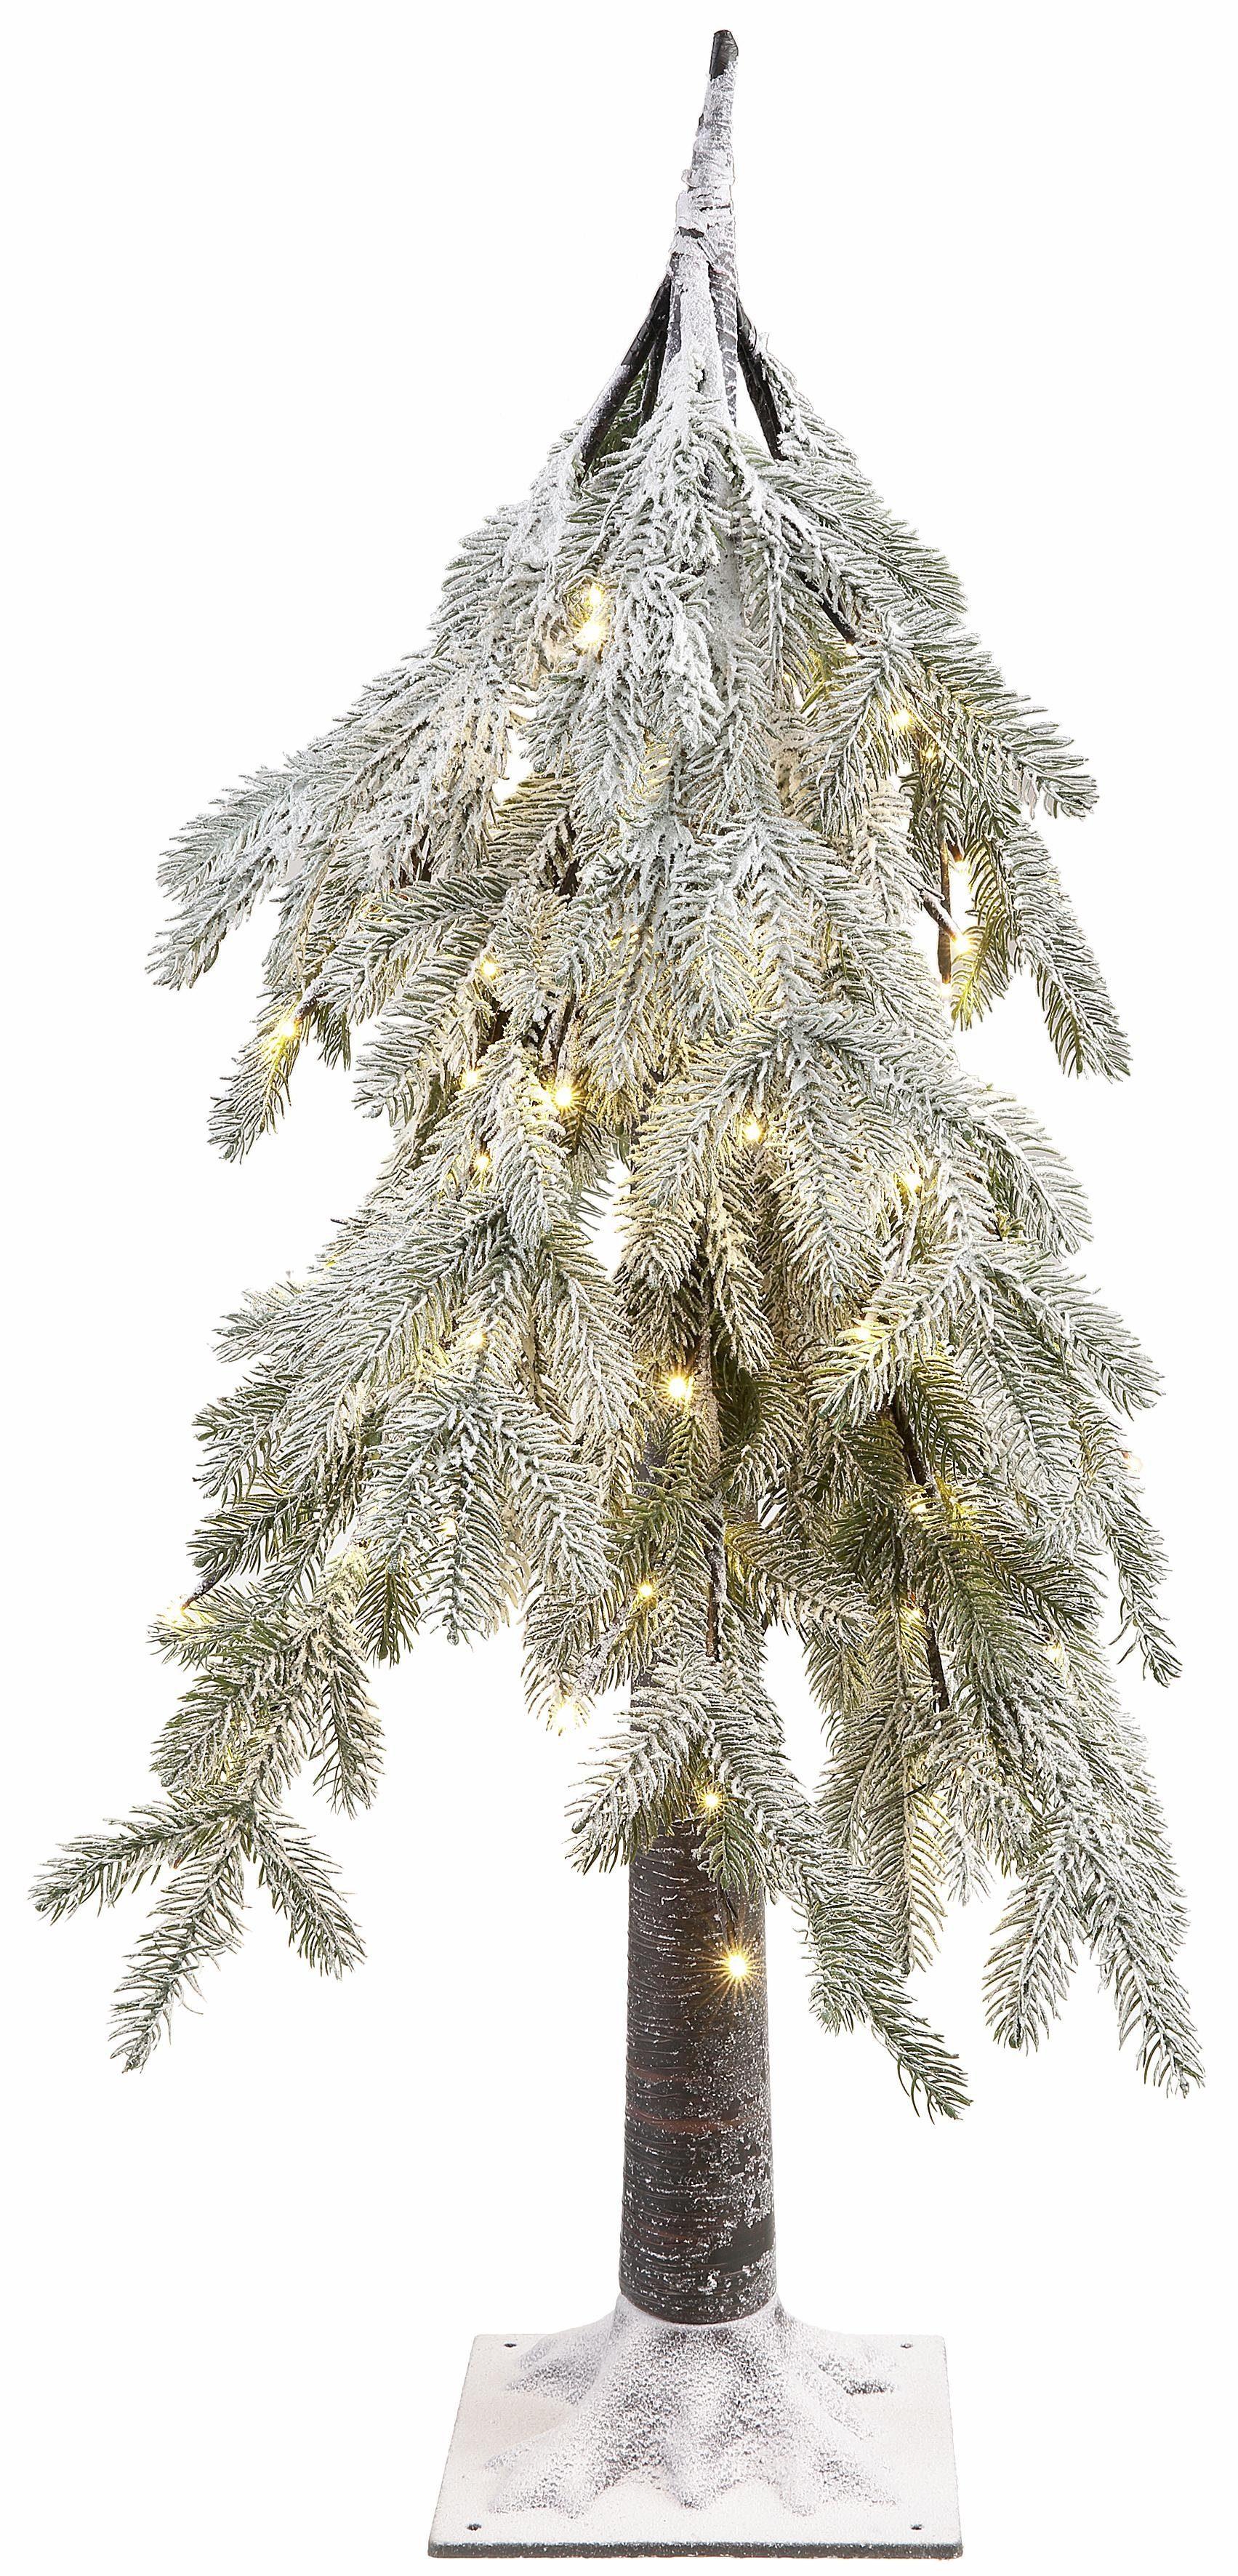 LED-Baum, leicht beschneit